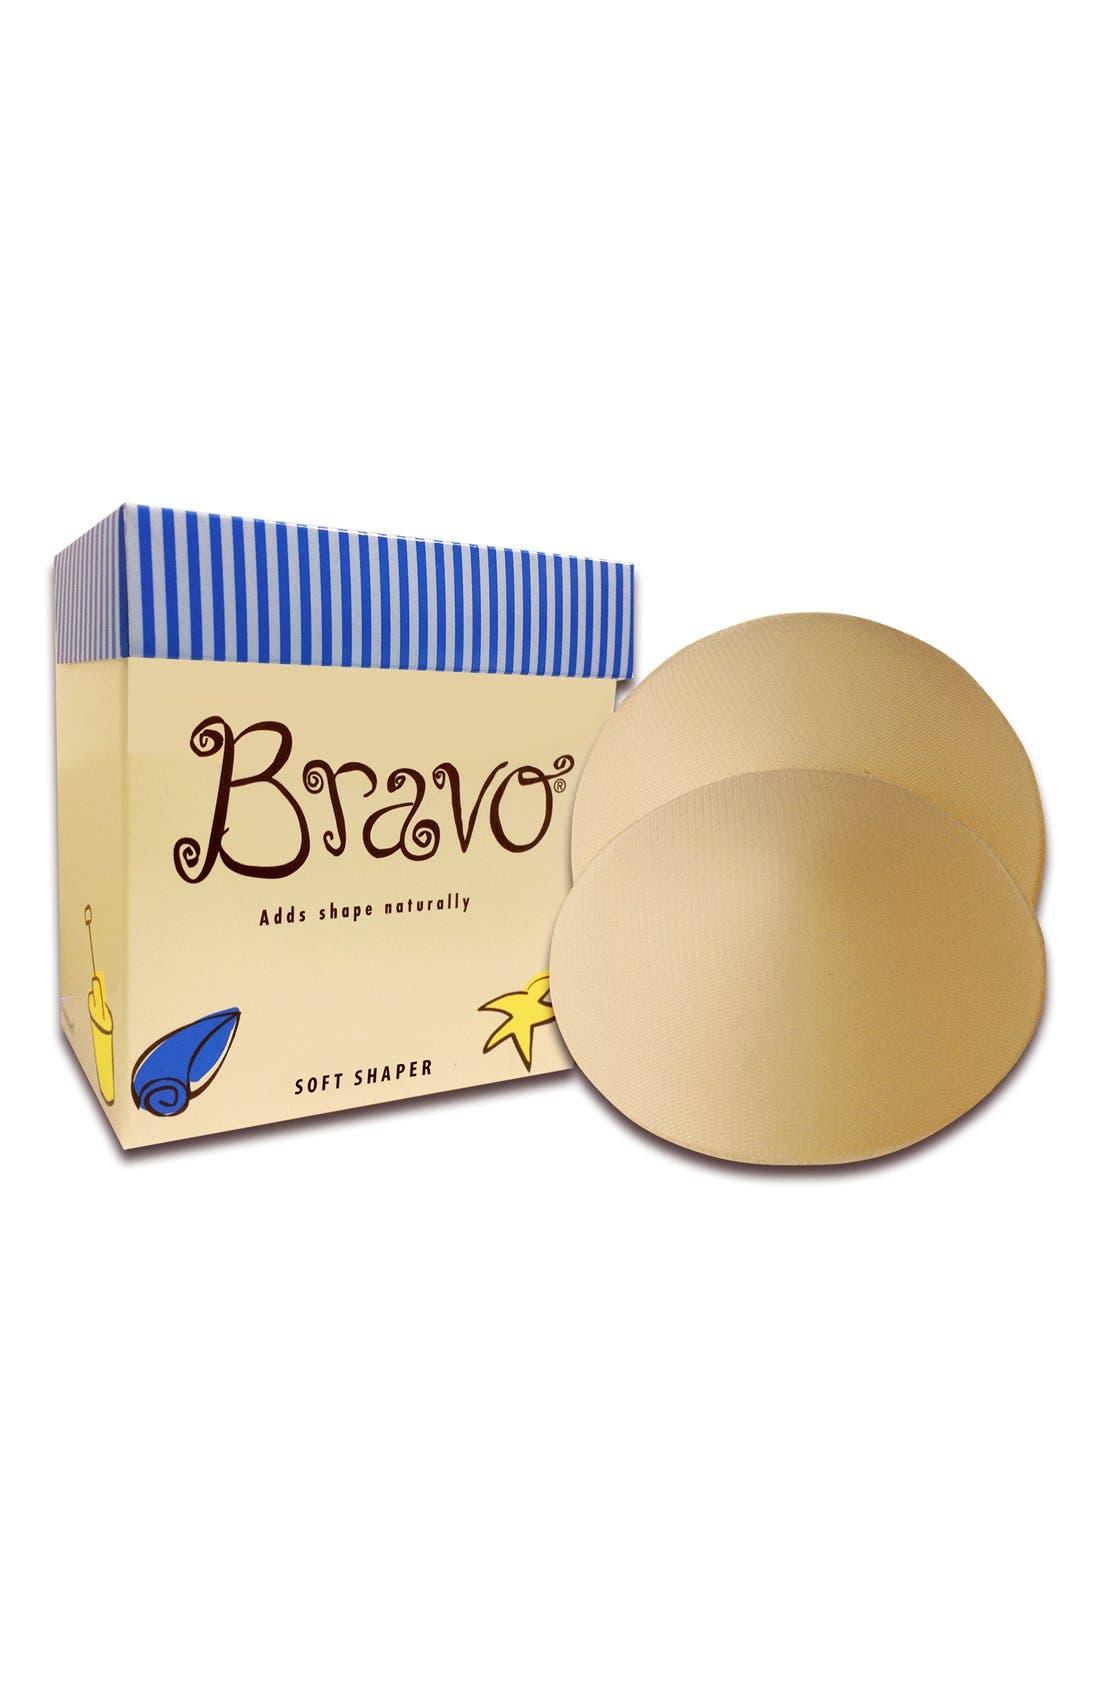 BRAVO Shaping Pads